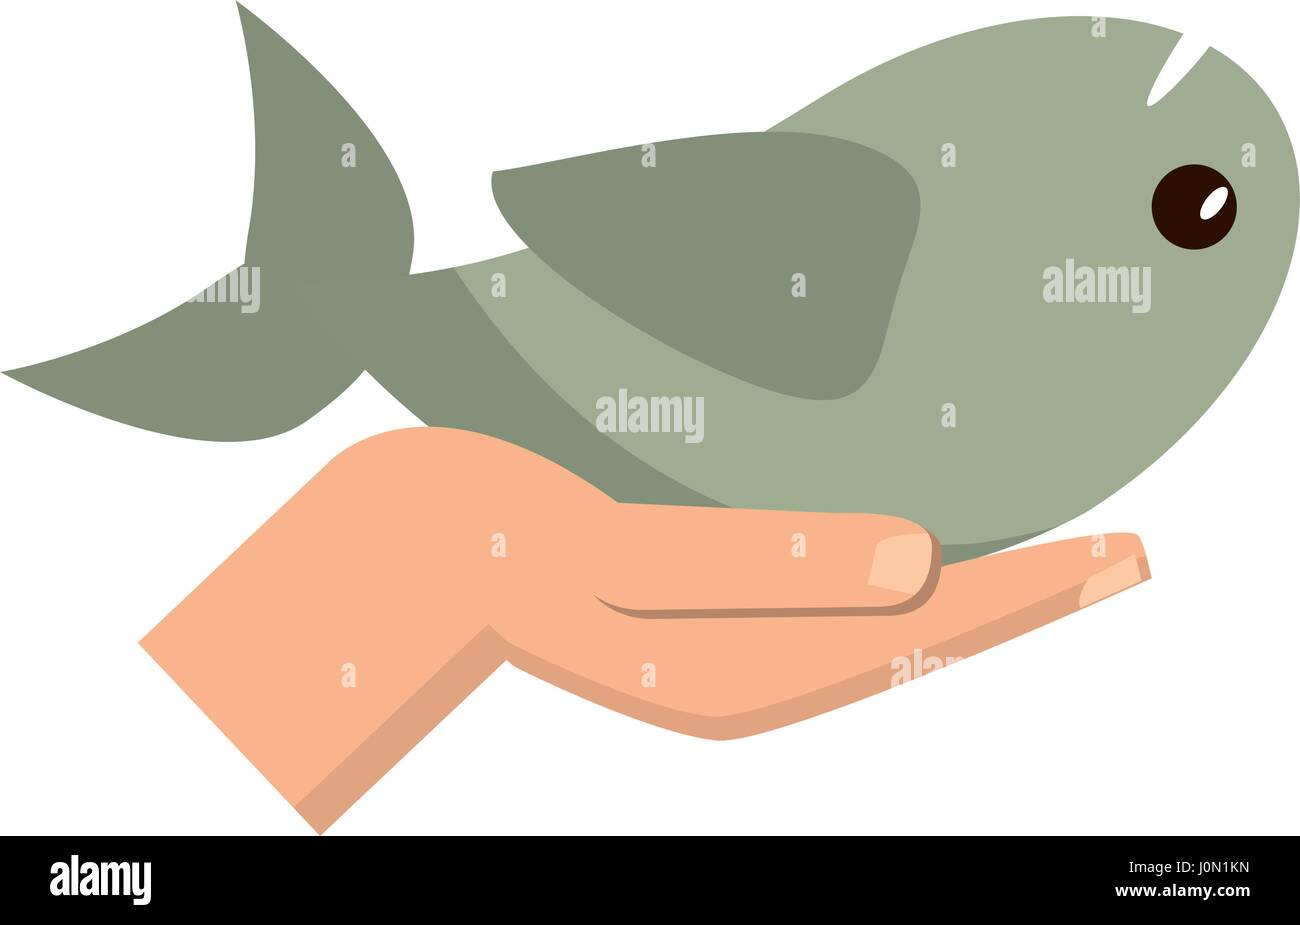 Hand Holding Fish Catholic Symbol Stock Vector Art Illustration